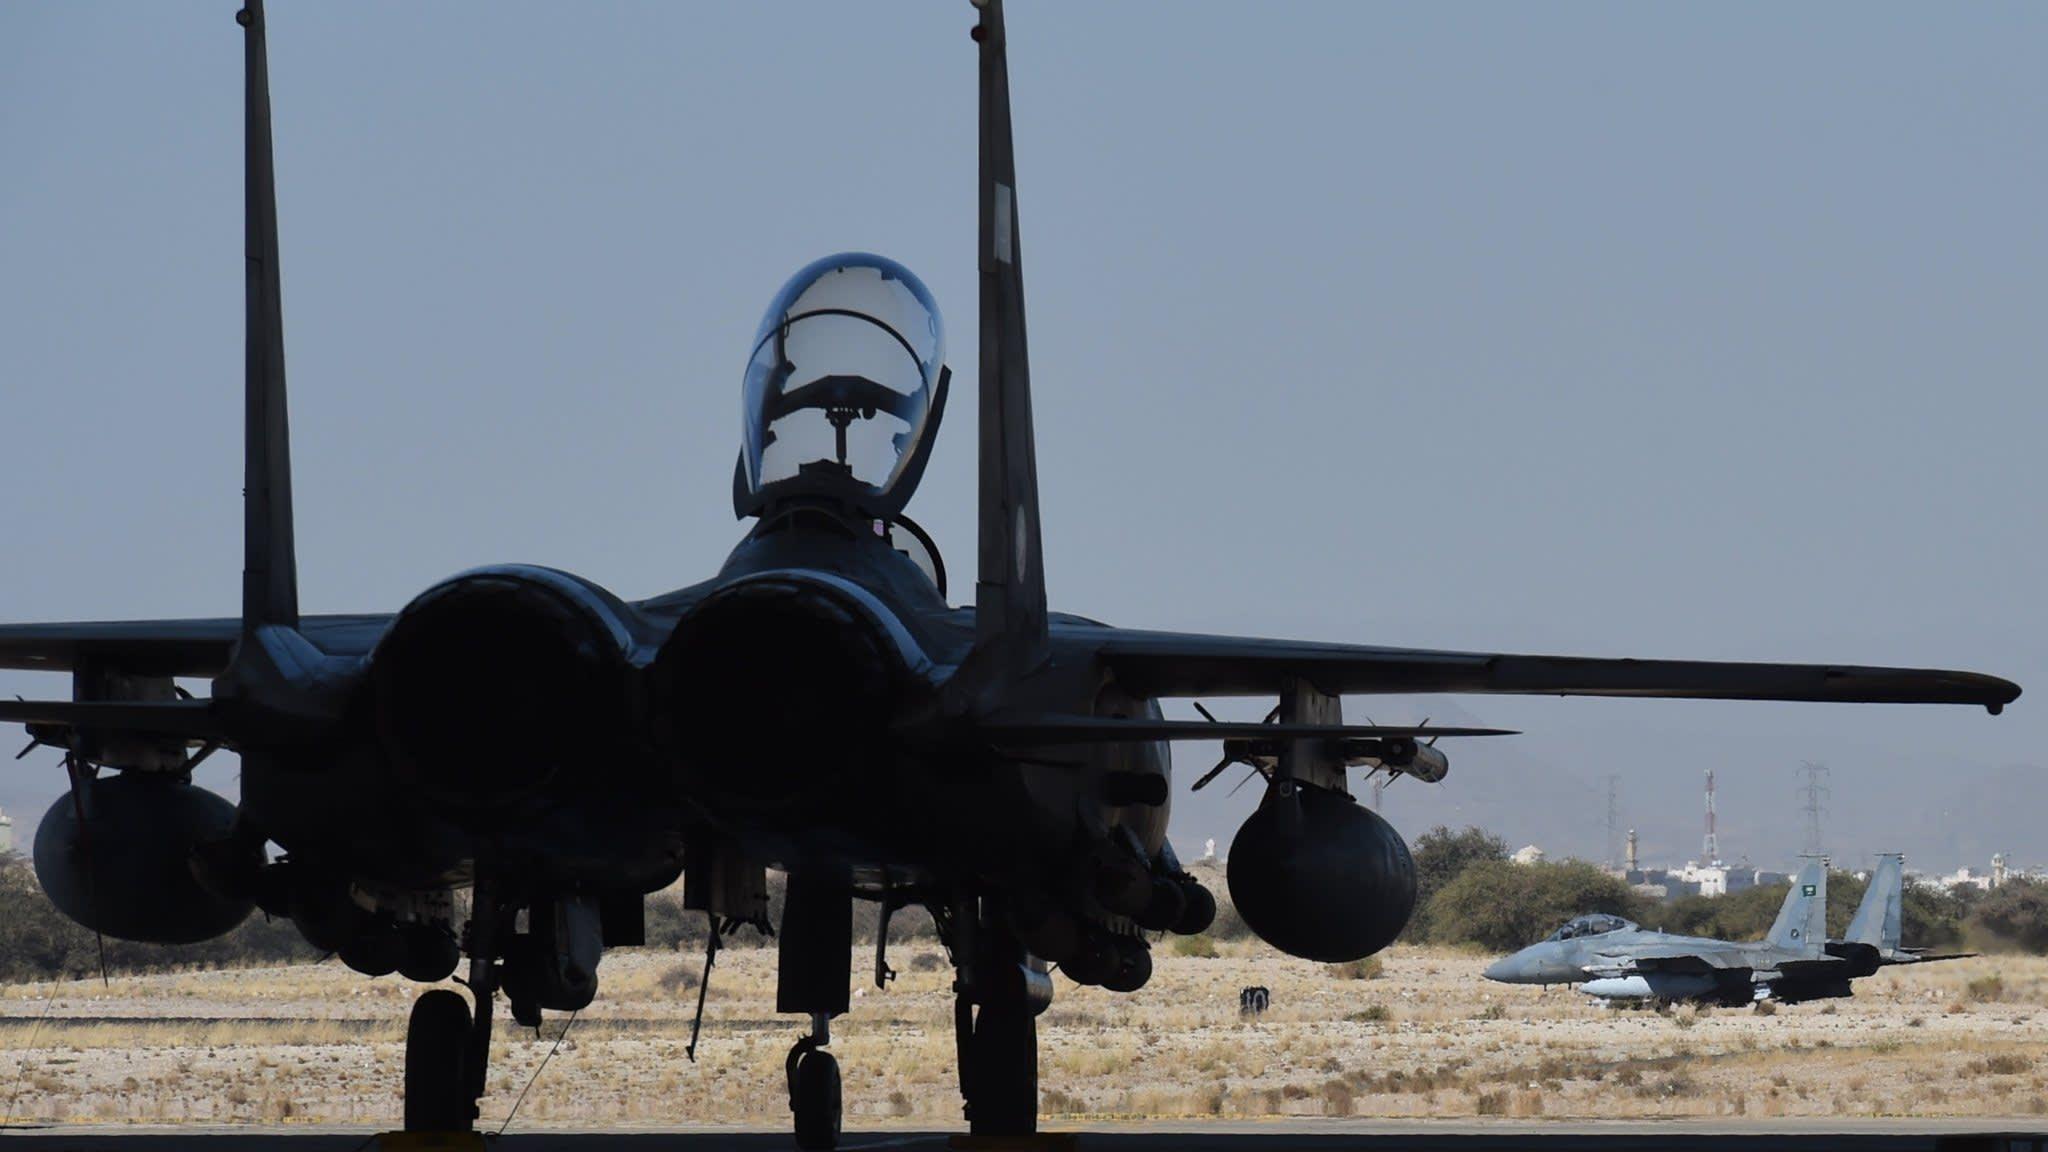 Germany halts arms exports to Saudi Arabia over Jamal Khashoggi